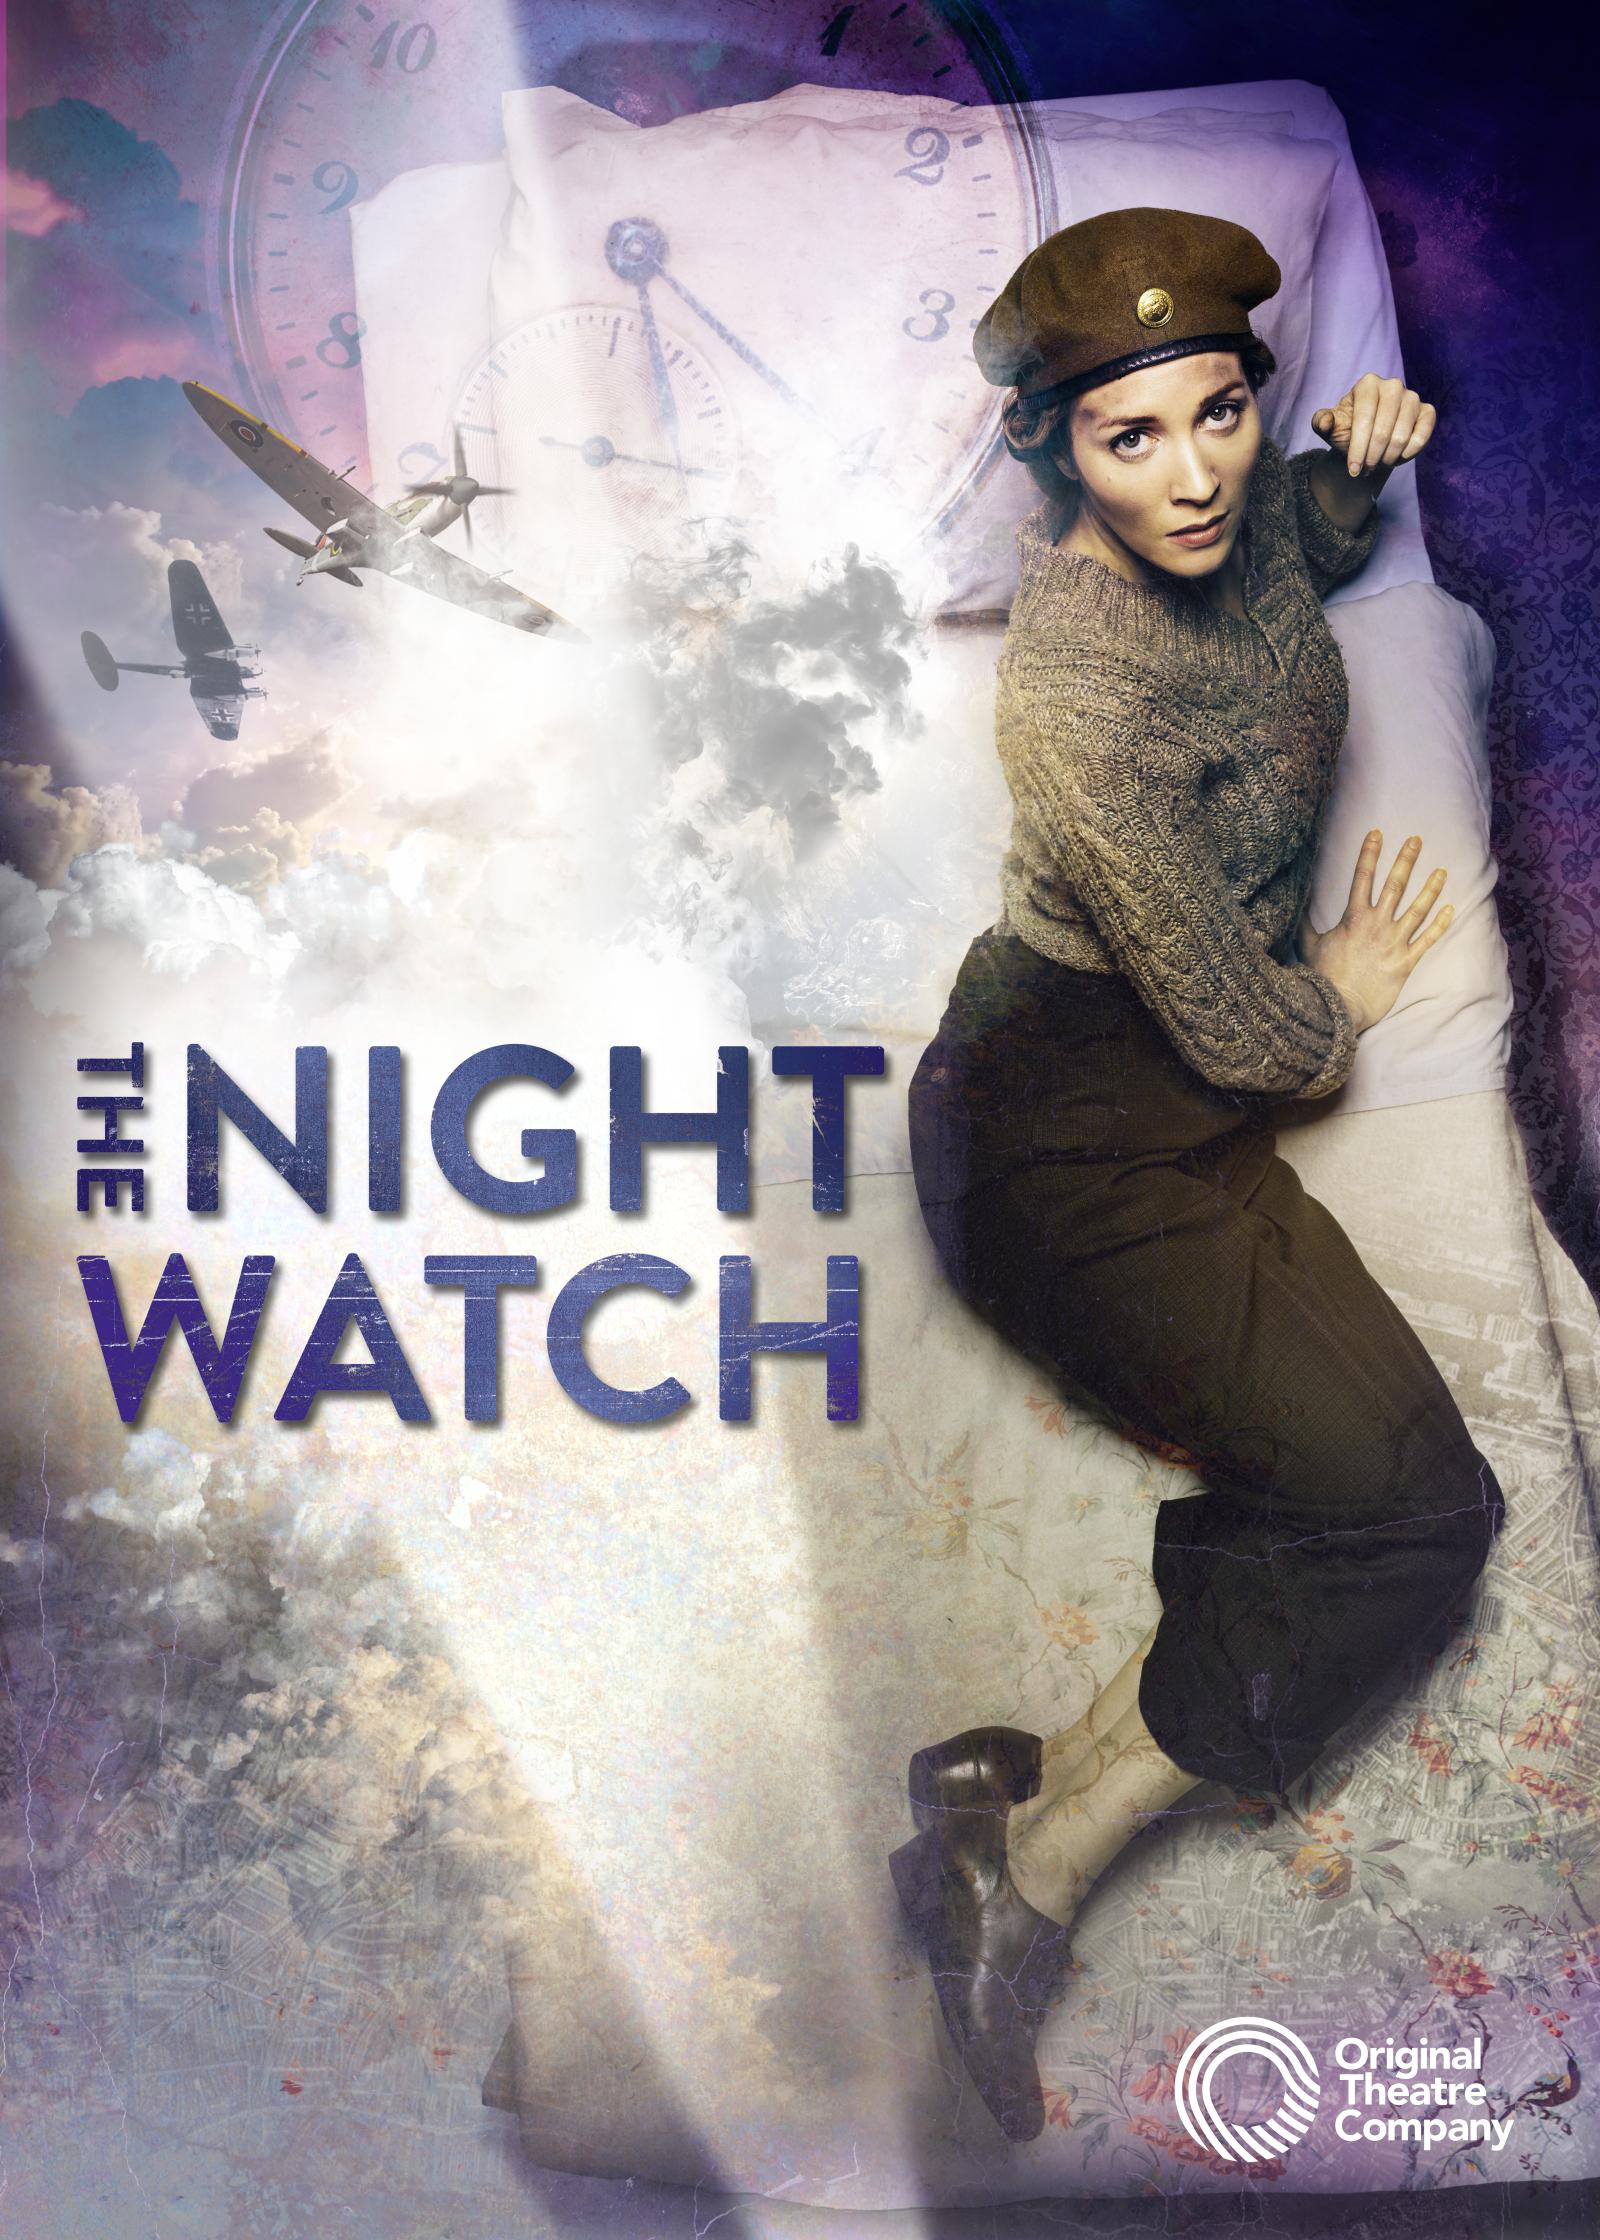 ORIGINAL_THEATRE_COMPANY-THE_NIGHT_WATCH.jpg